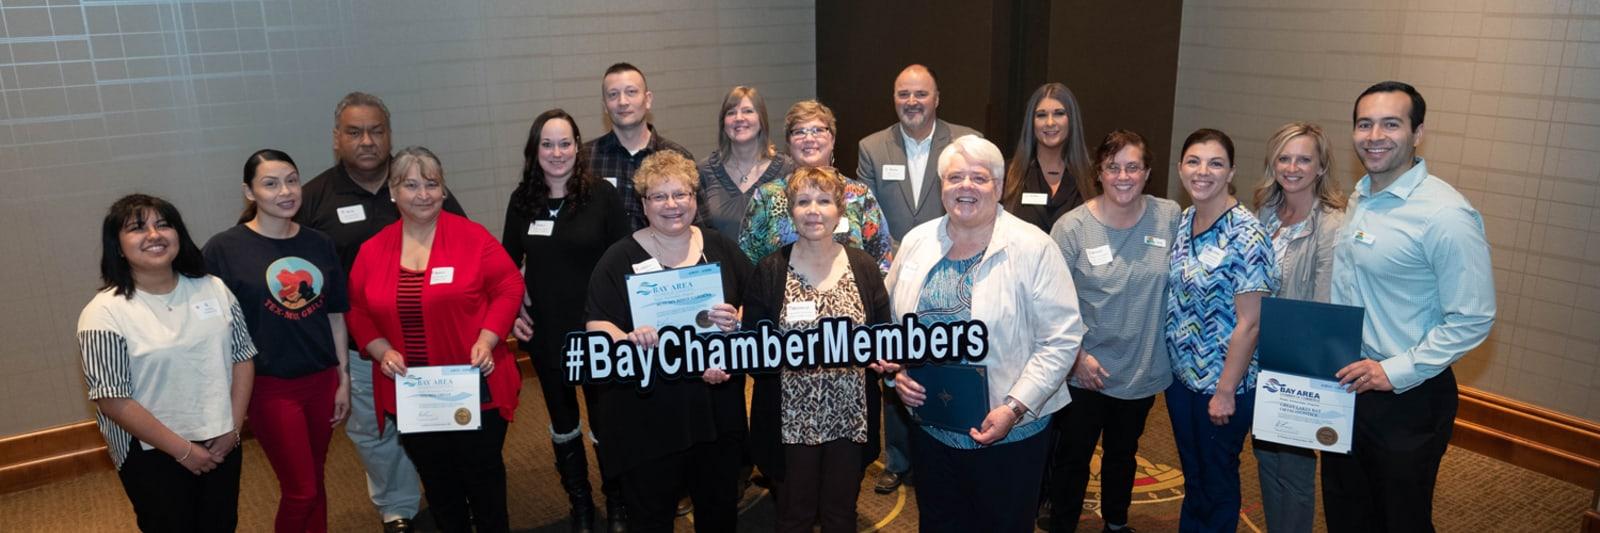 Chamber-May-2019-051-w1600.jpg